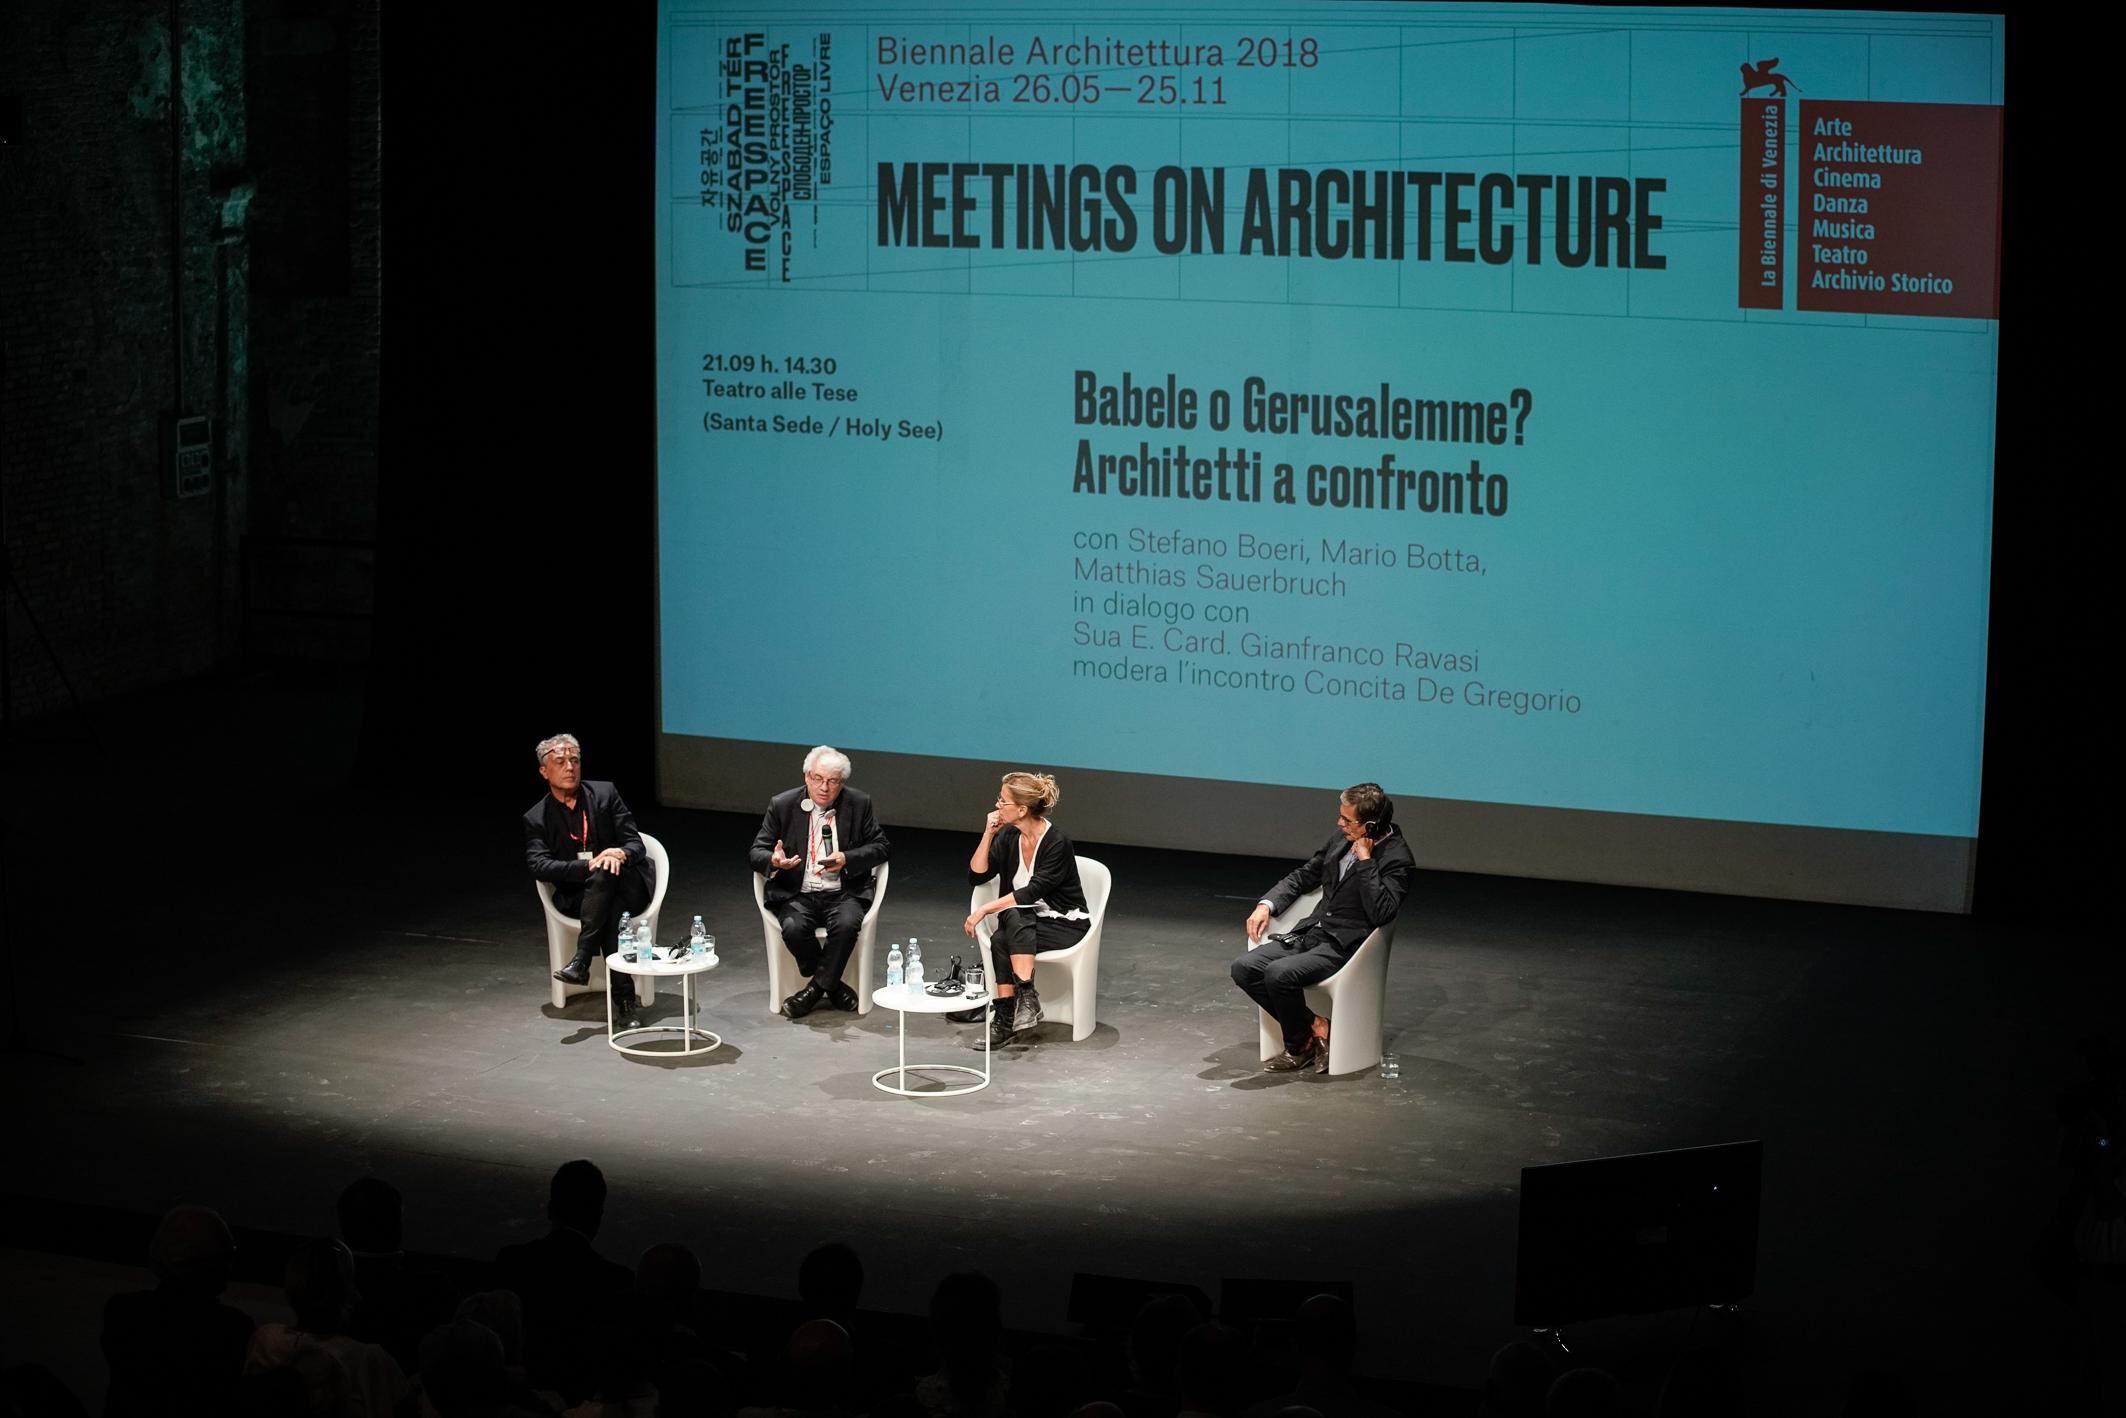 botta_boeri_sauerbruch_concita de Gregorio_biennale_architettura_meetings on architecture